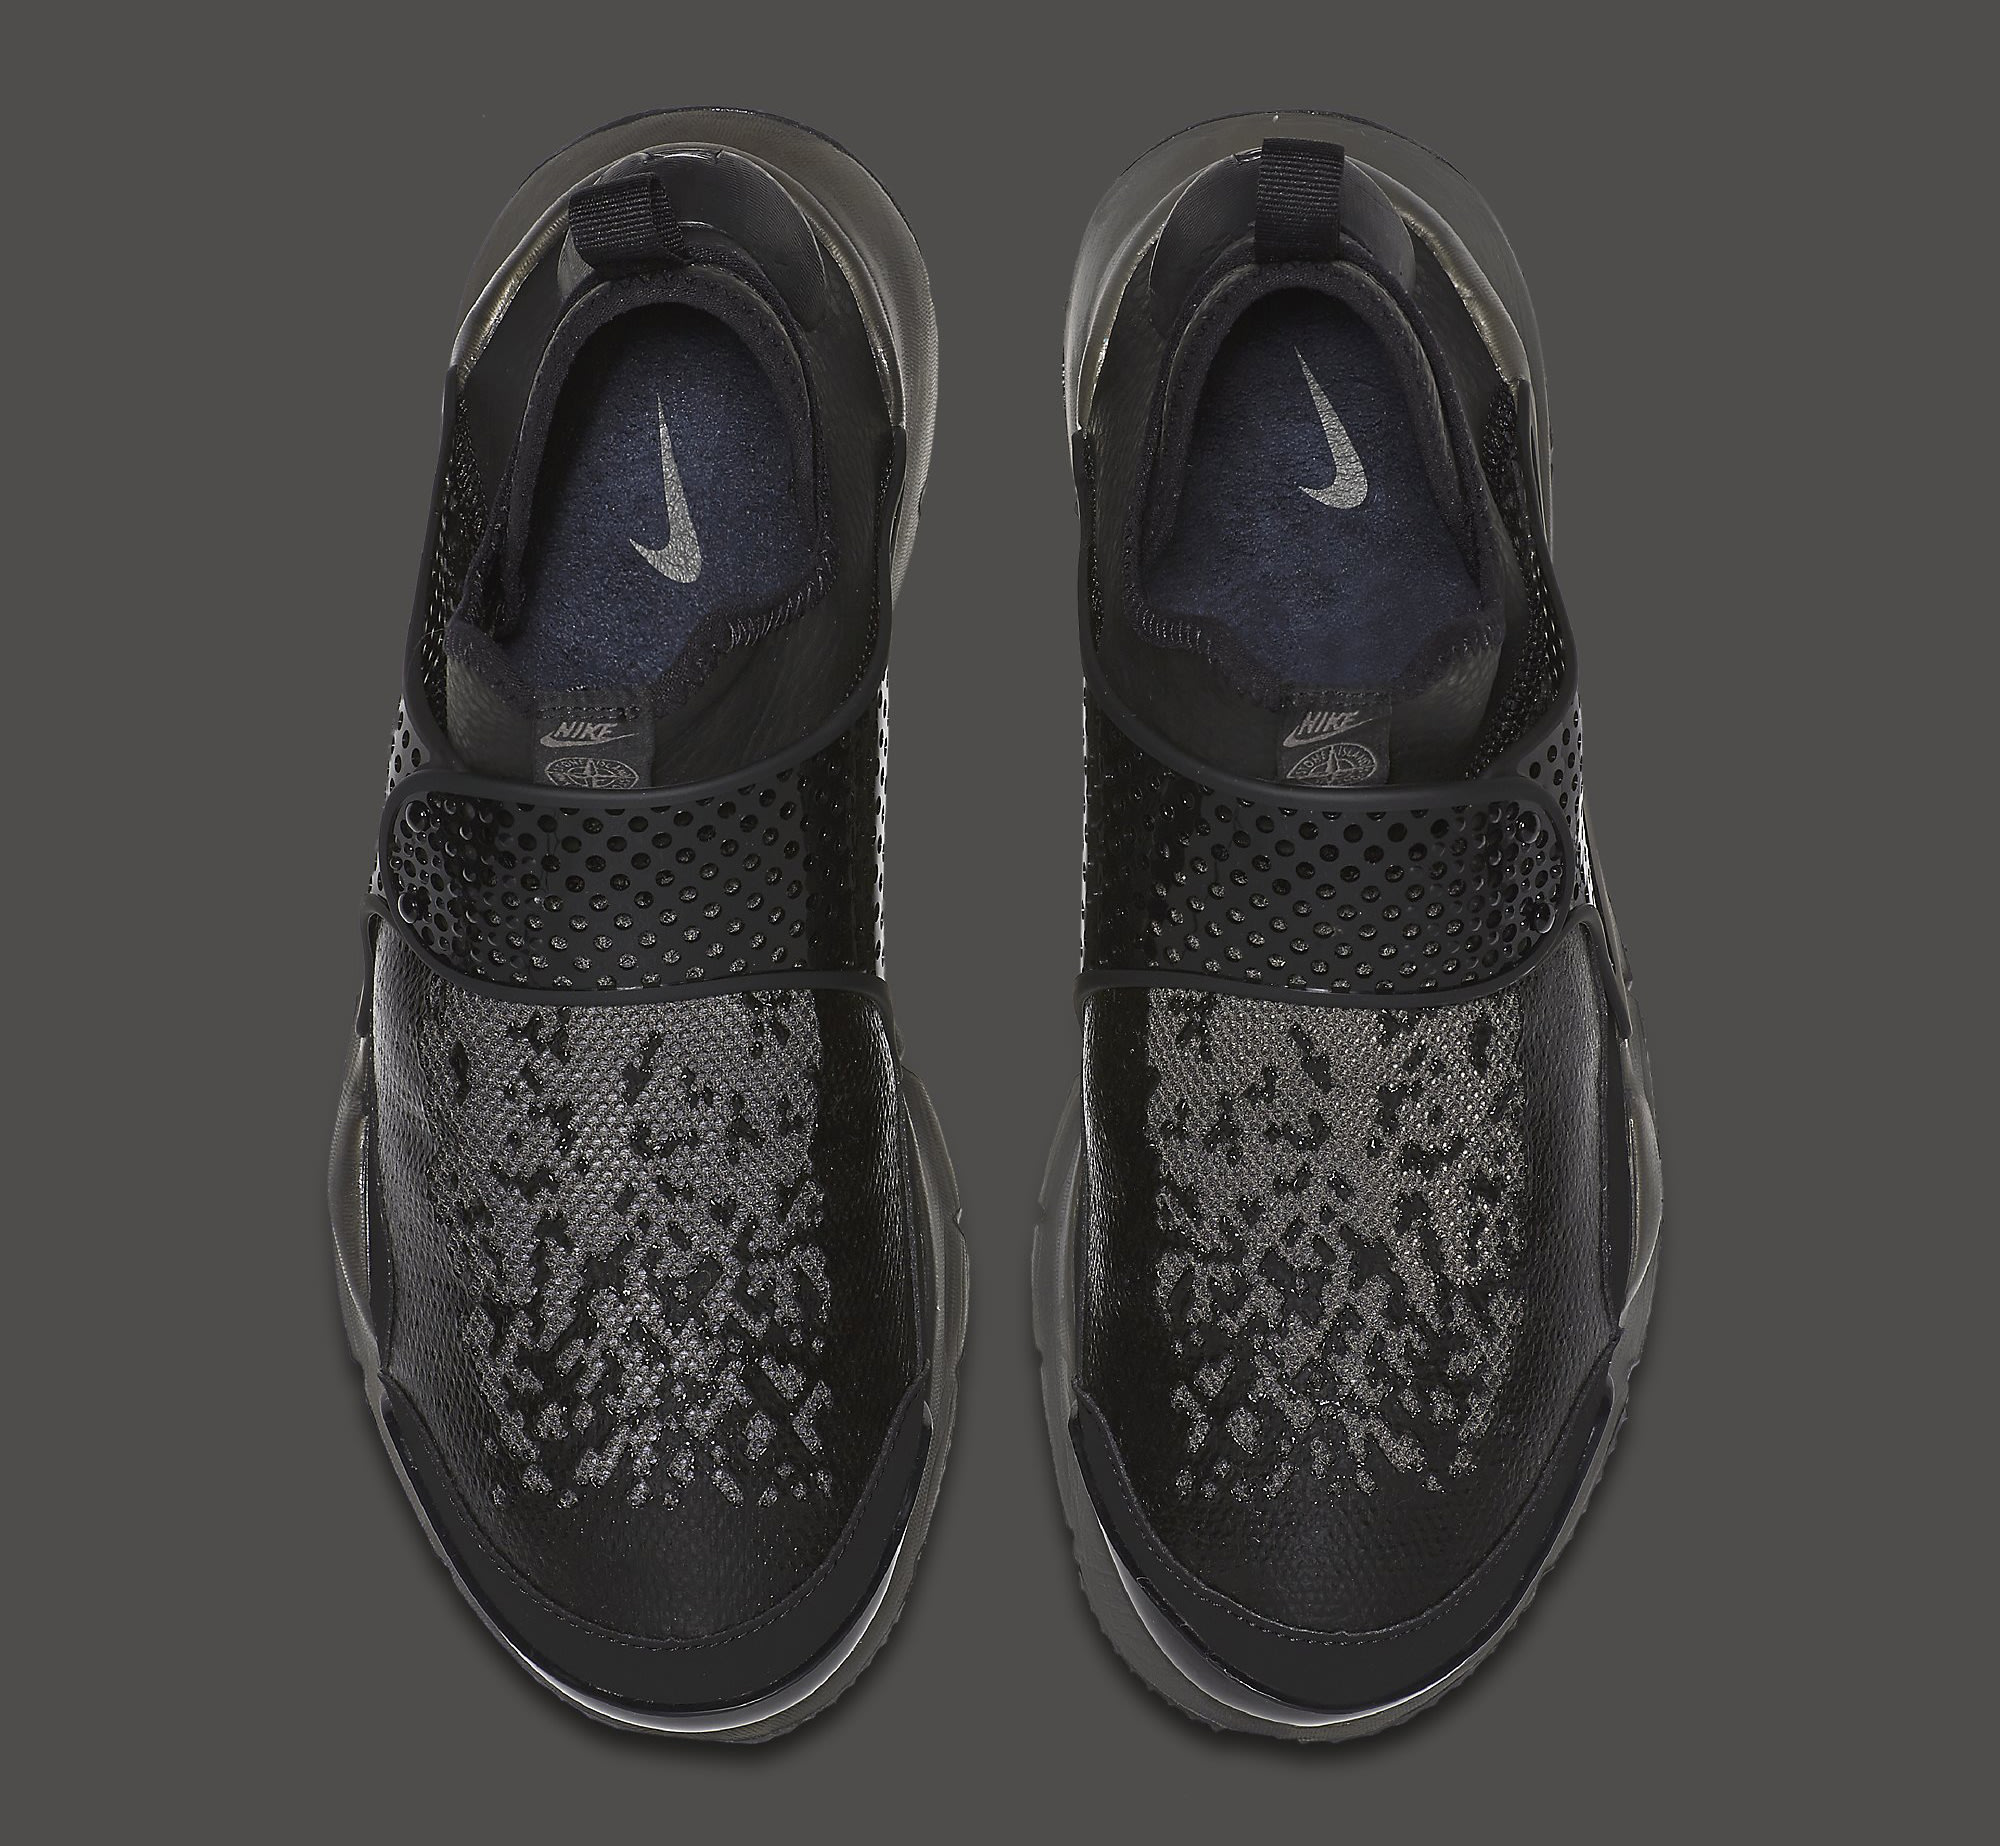 Stone Island Nike Sock Dart 910090-001 Top